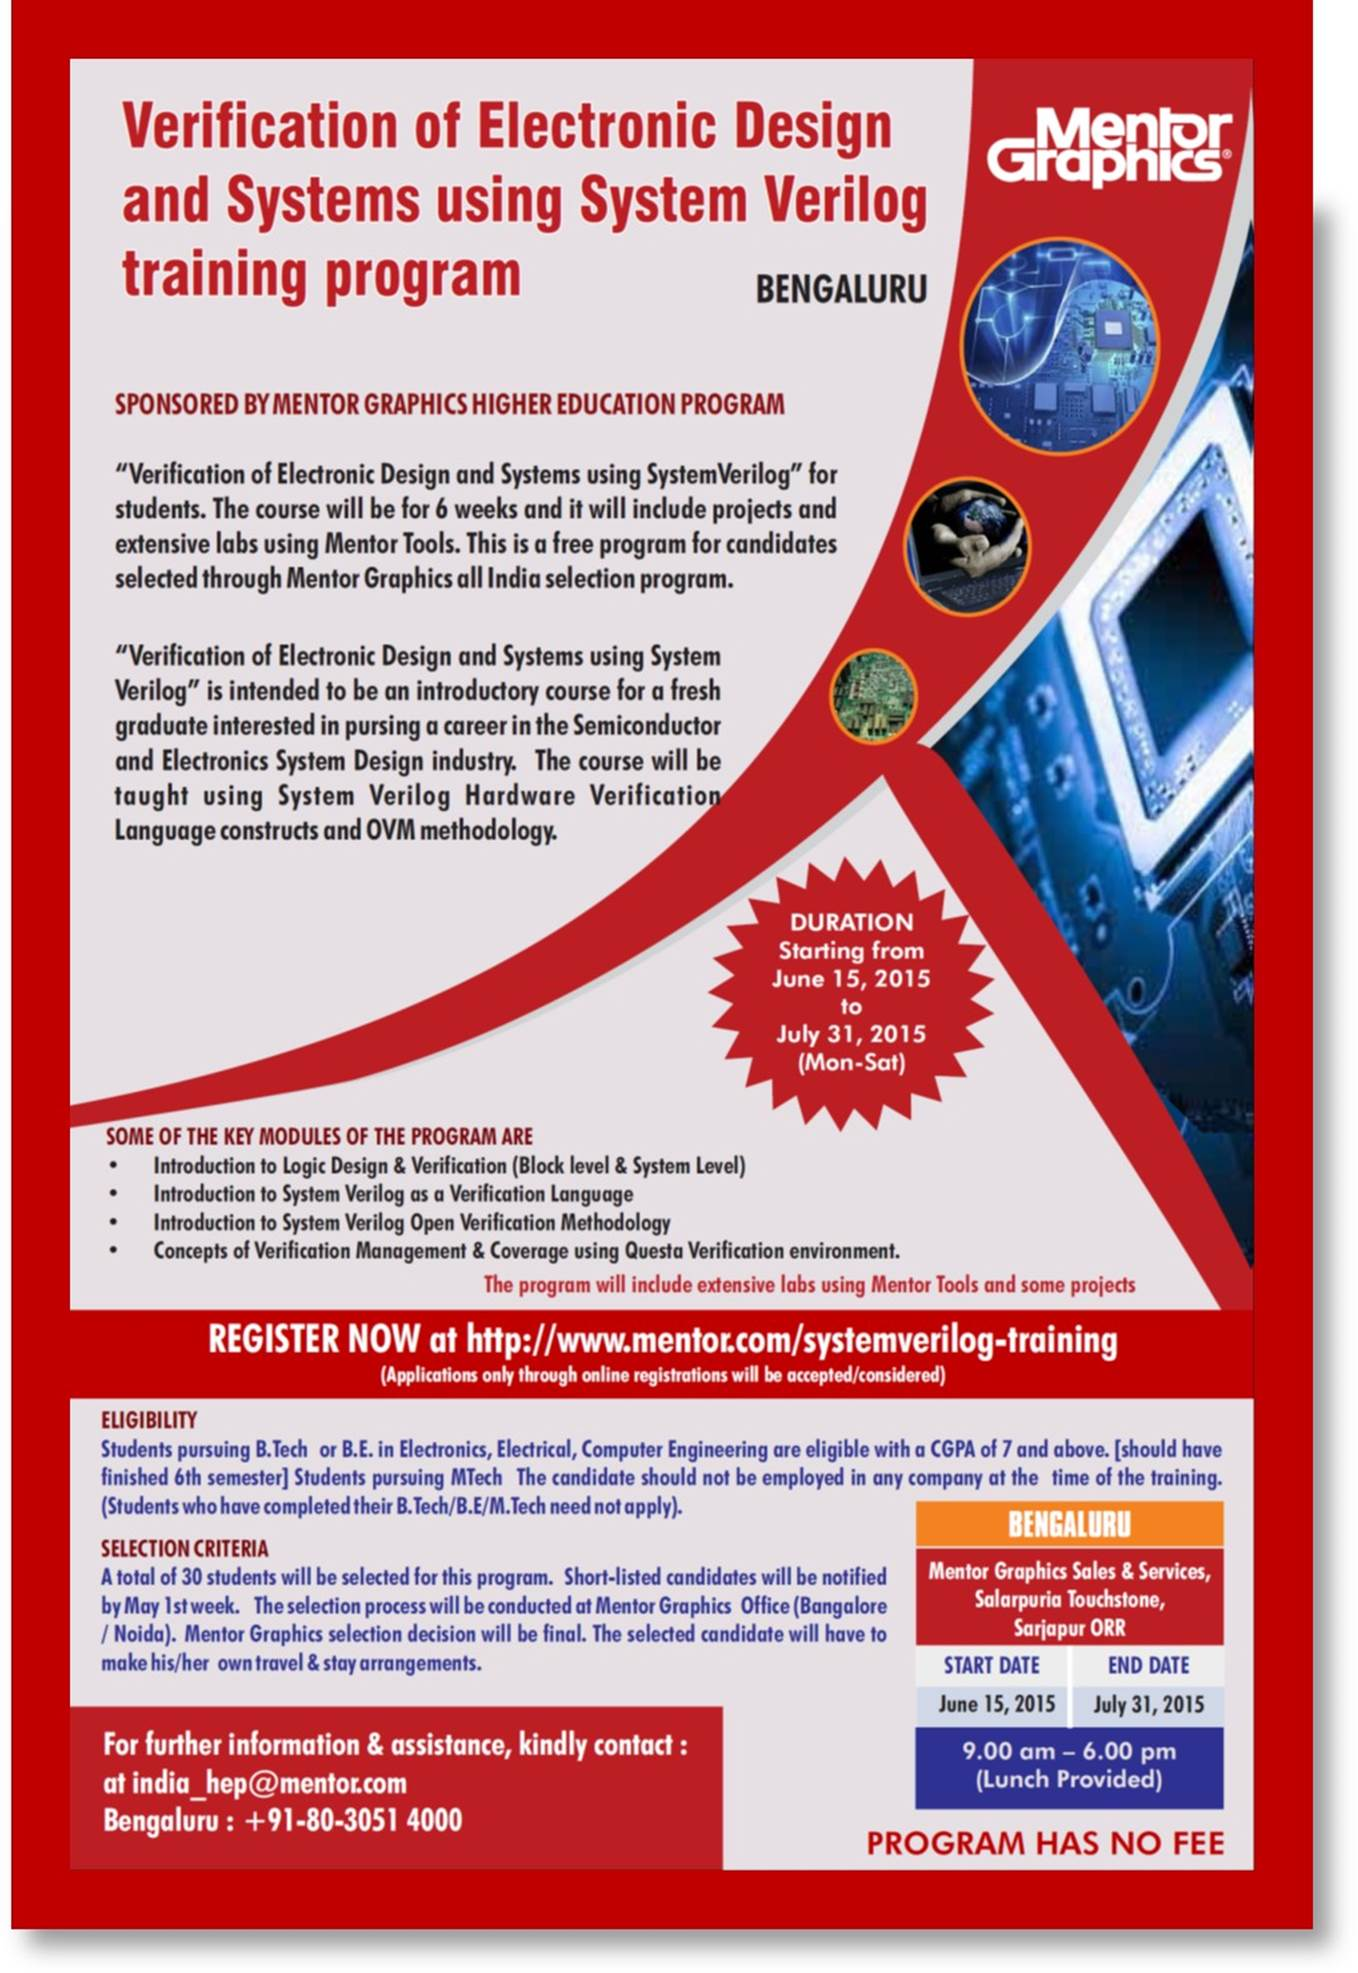 Free Professional 6 weeks Mentor Graphics System Verilog